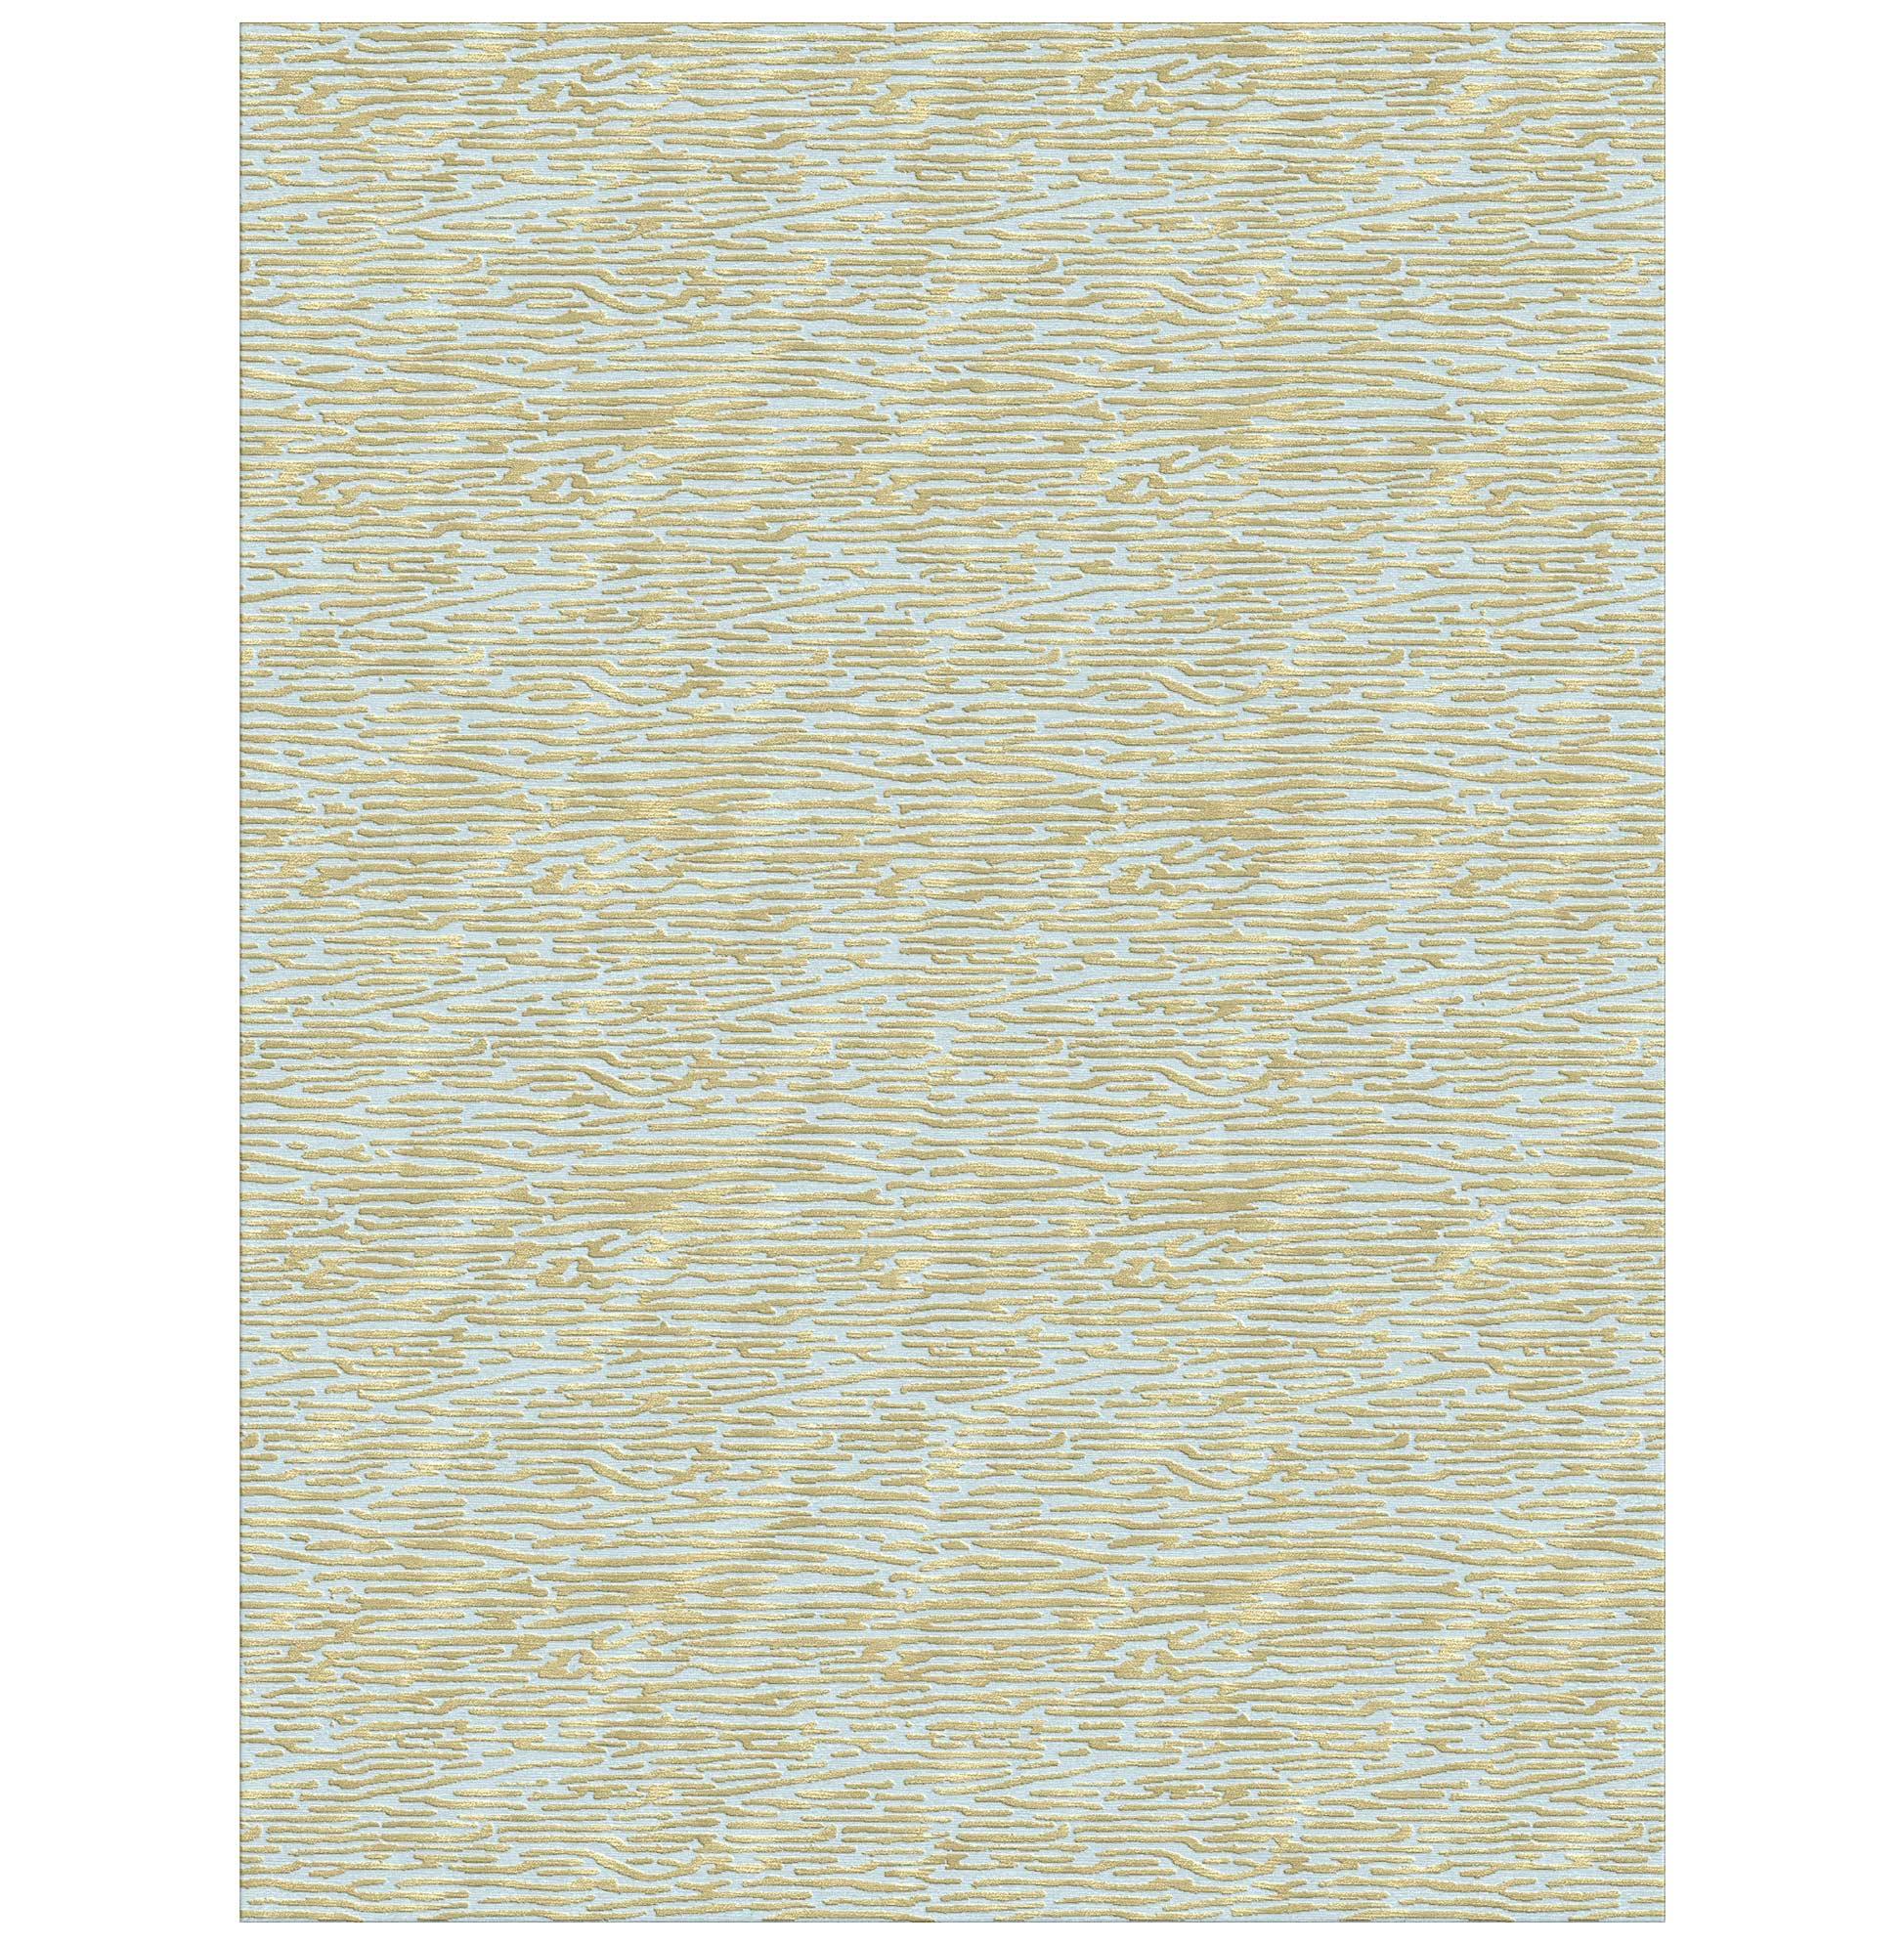 Jules Blue Gold Hand Knotted Tibetan Wool Rug - 10x14